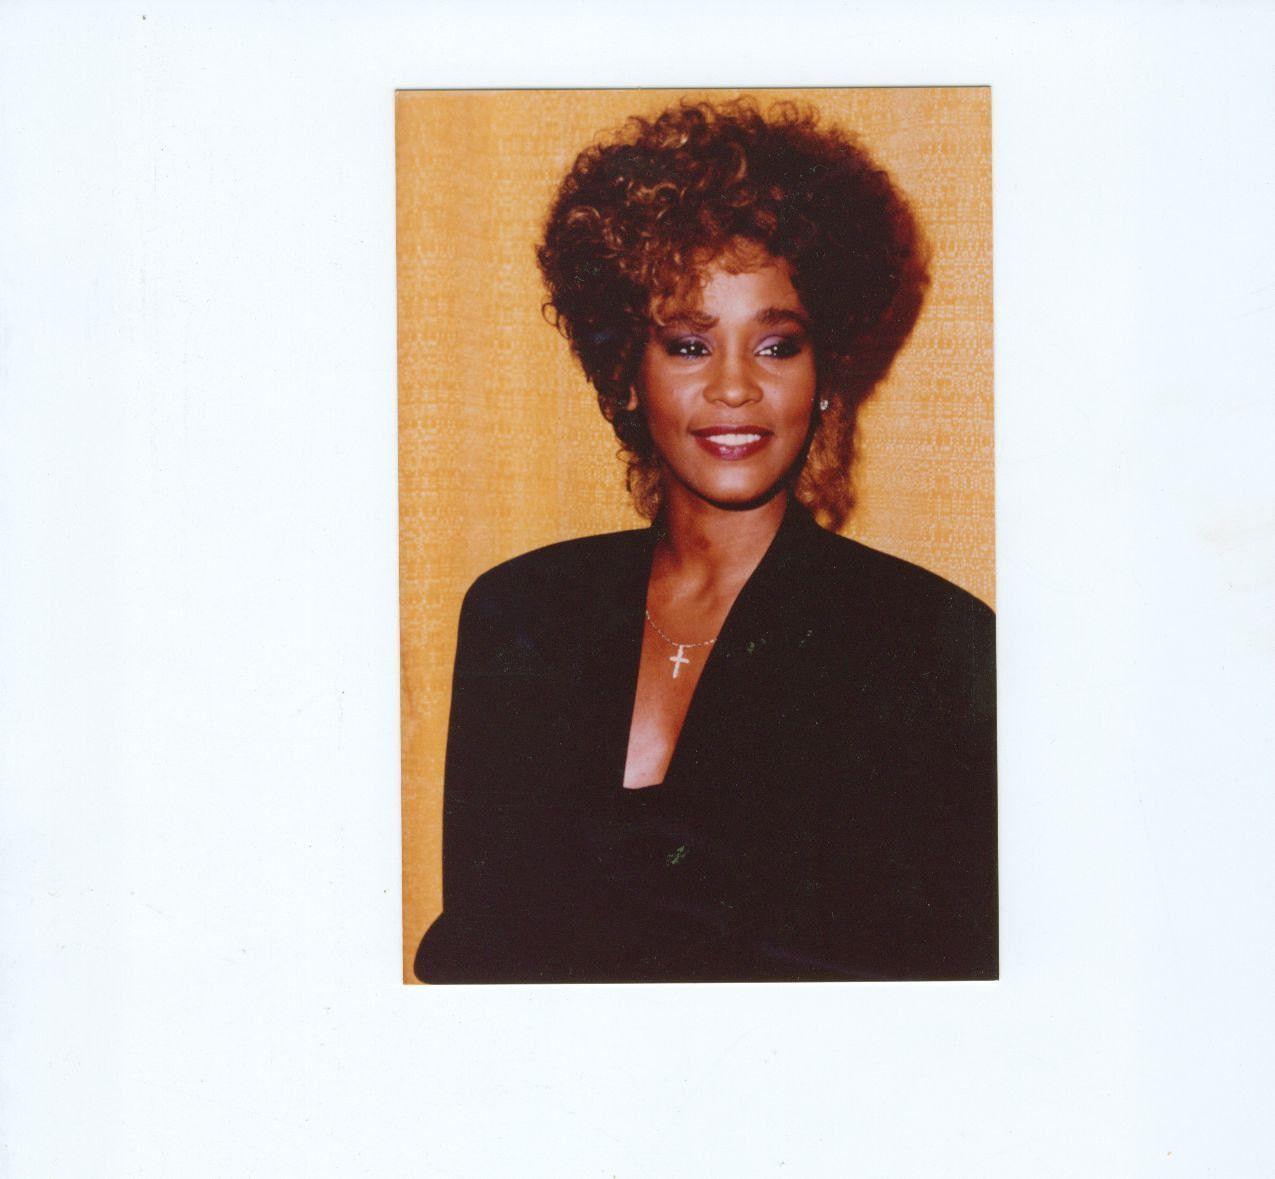 Vintage Whitney Houstin 4x6 Color Photograph